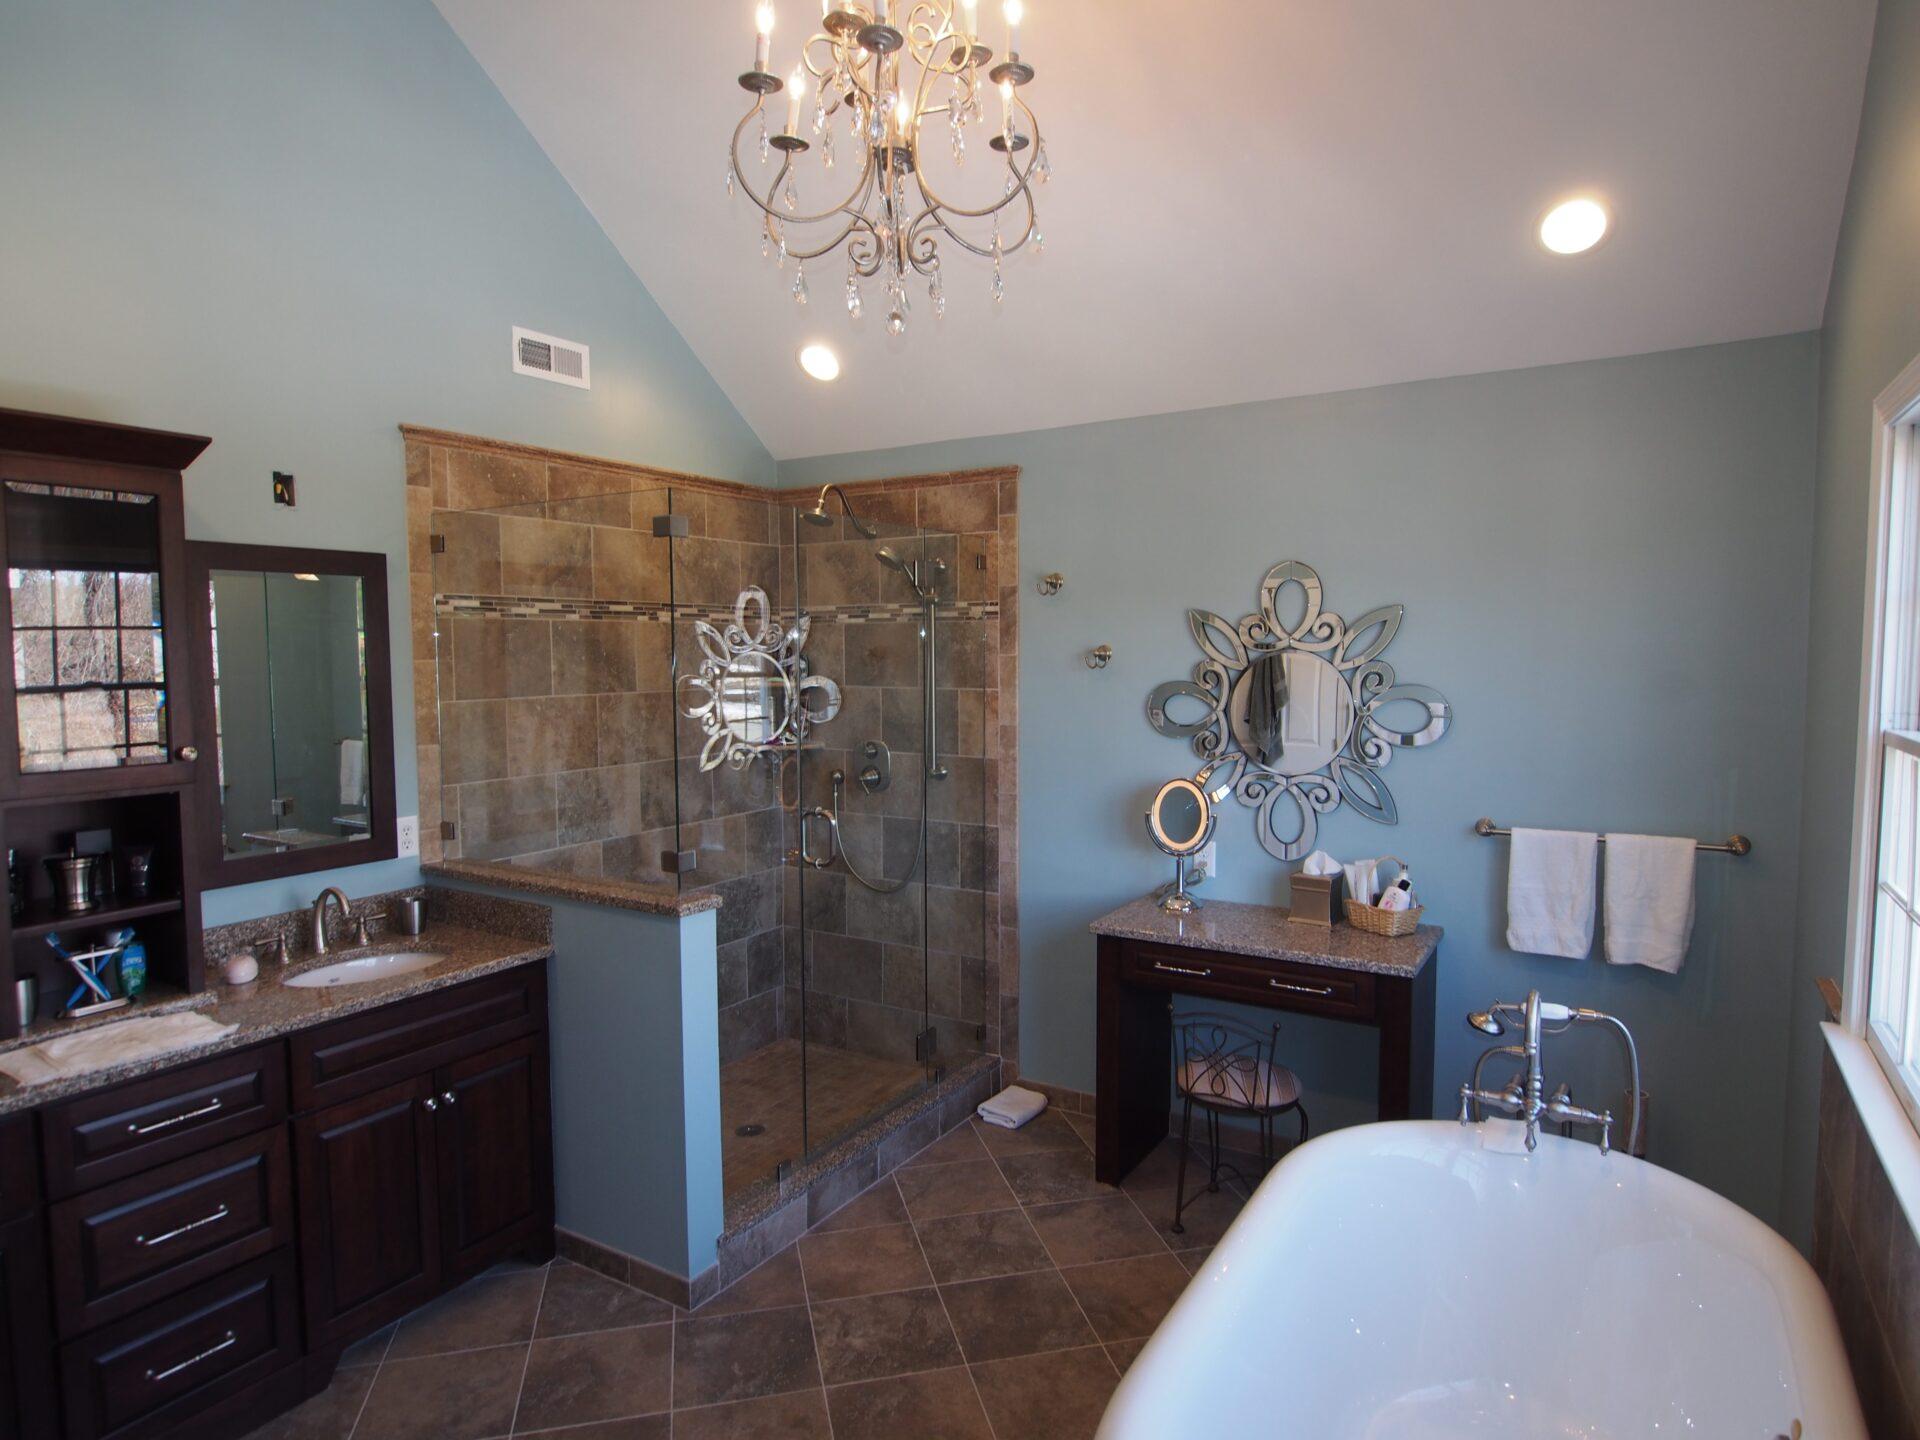 Bathroom Remodeling & Renovation Contractor   Annandale, NJ